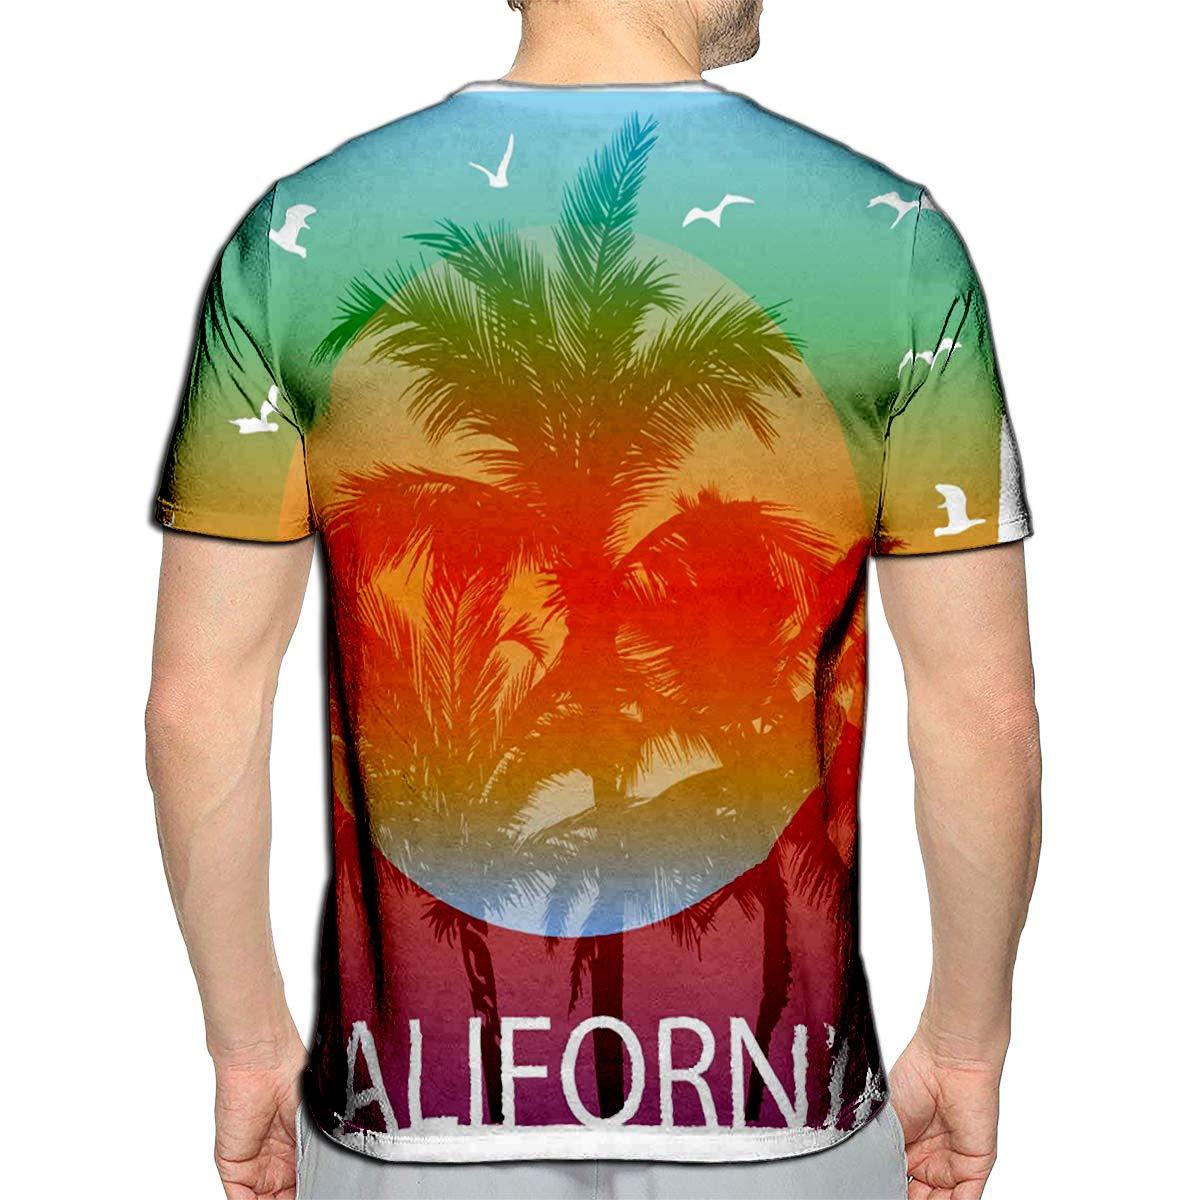 Randell 3D Printed T-Shirts California Summer Short Sleeve Tops Tees